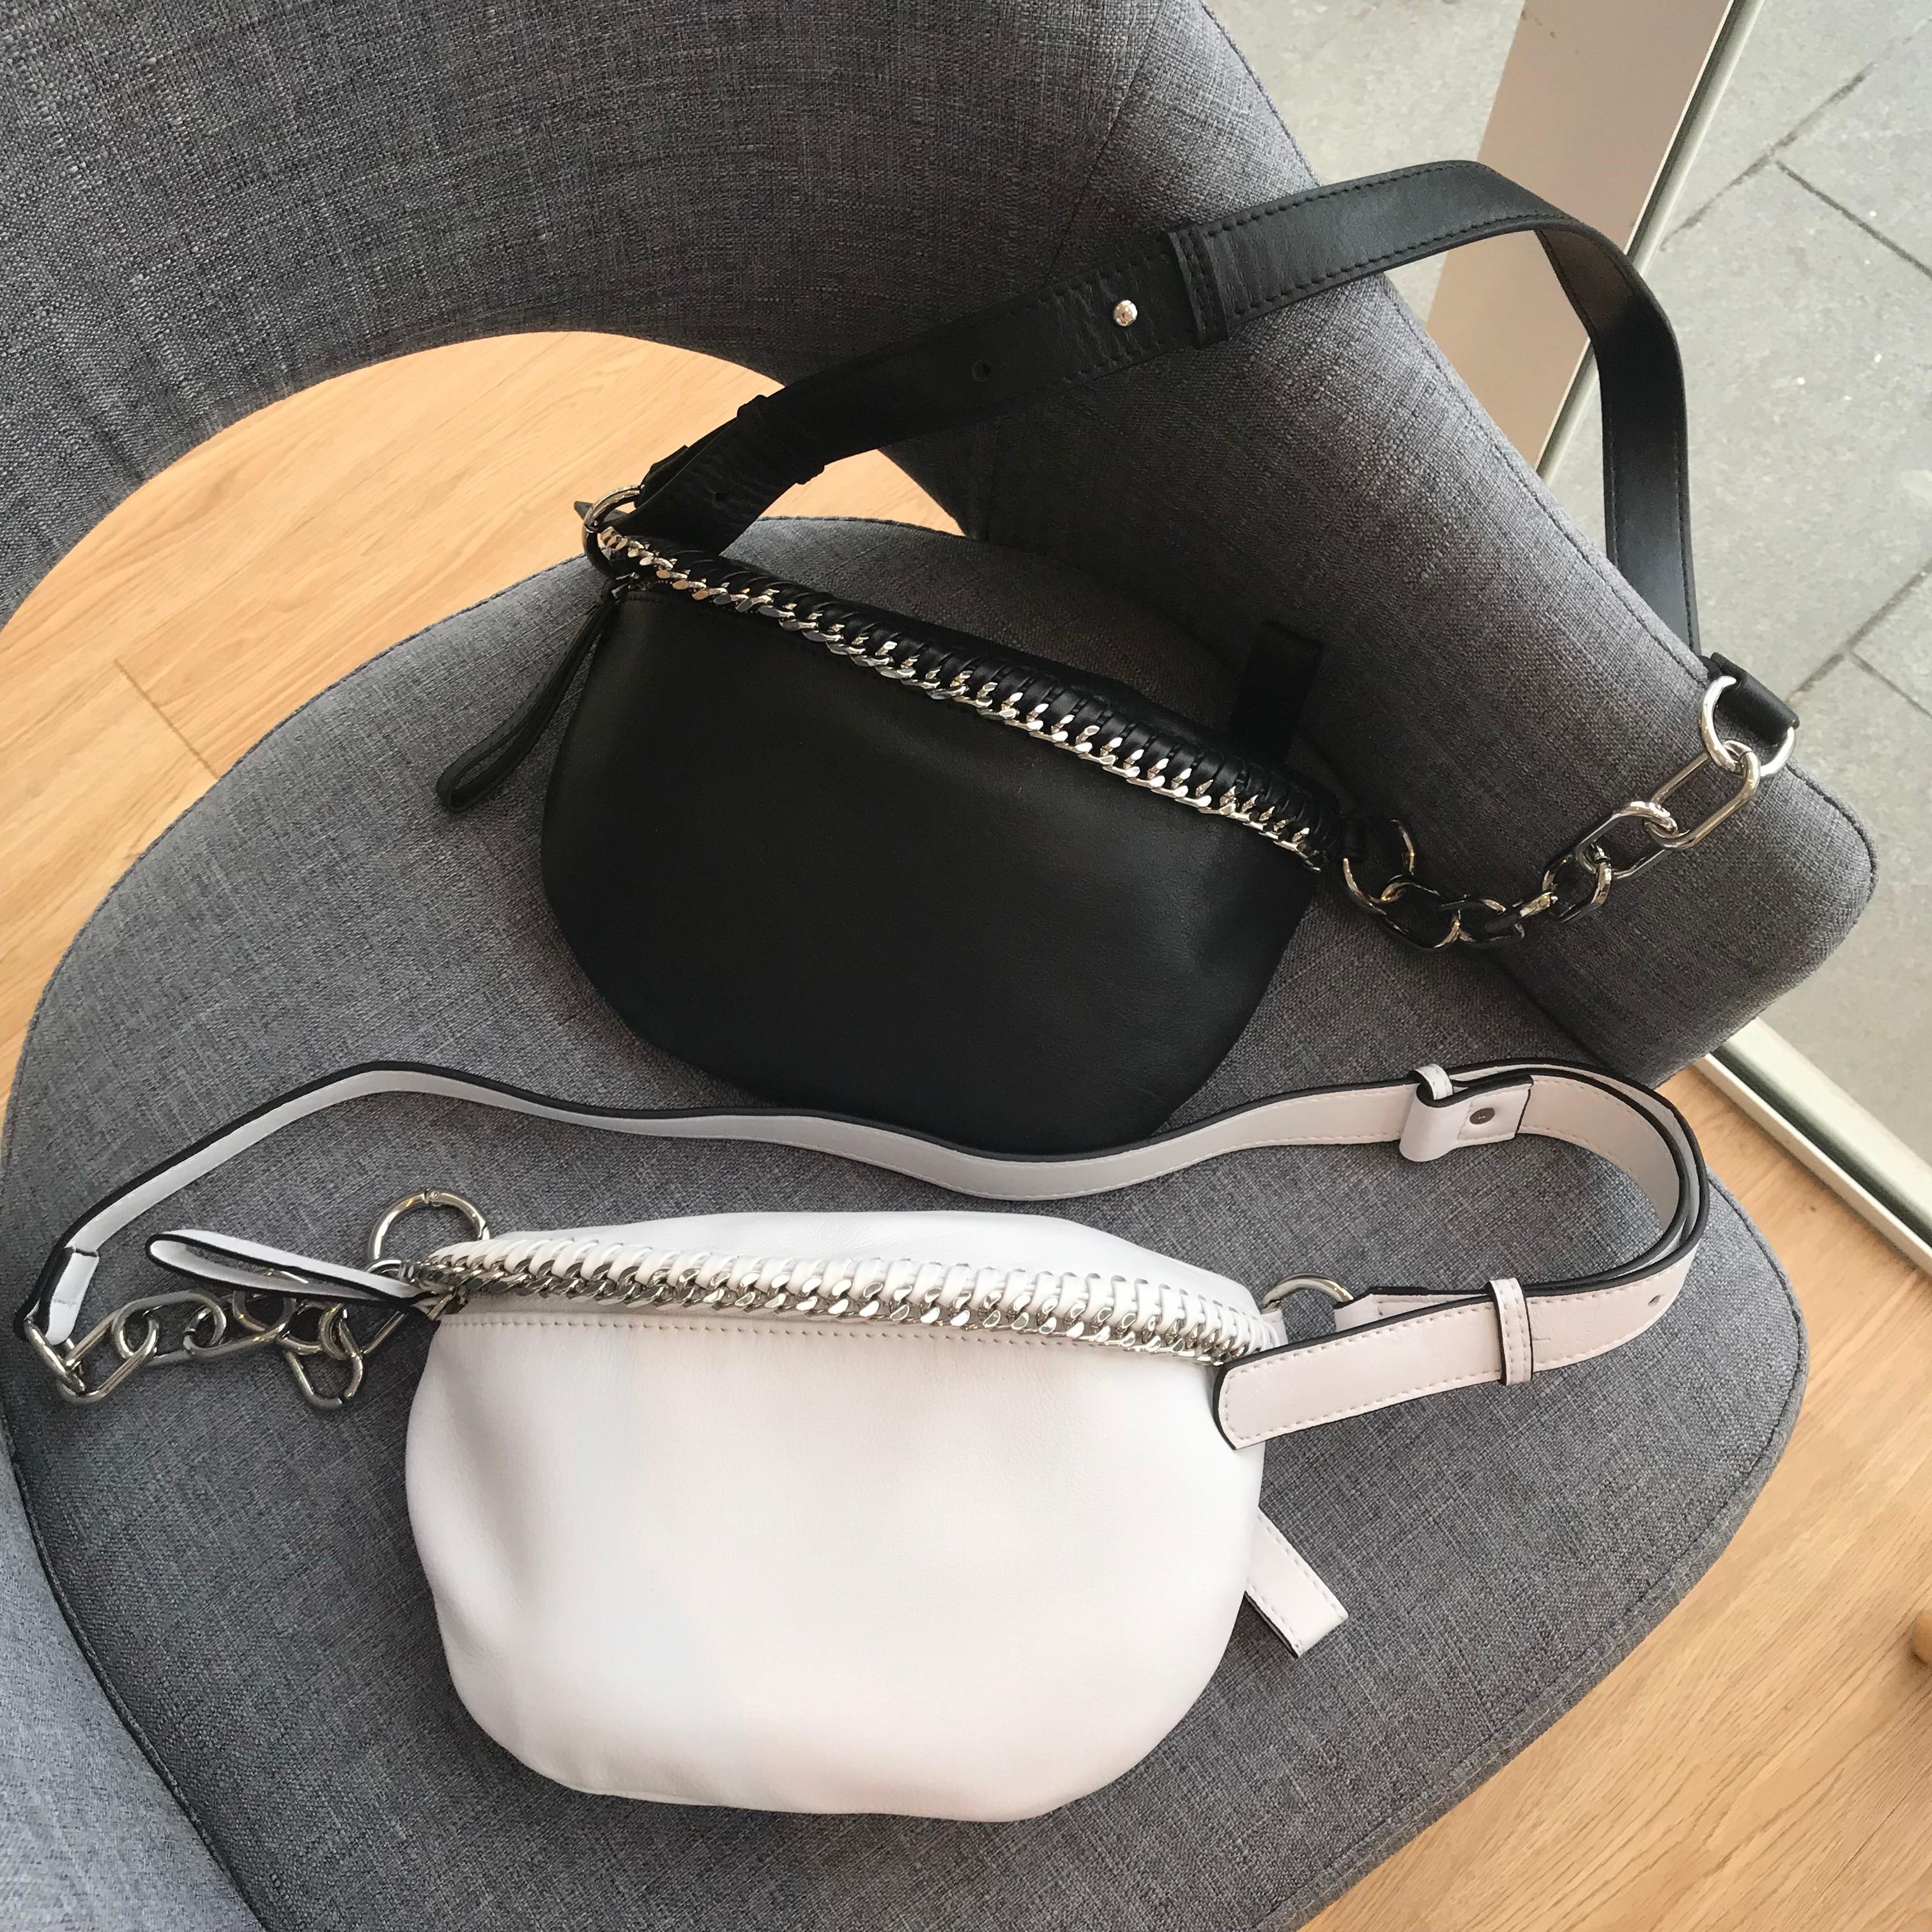 Kafunila Genuine Leather Saddle Bags For Women 2019 Luxury Handbags Women Bags Designer Crossbody Chest Waist Bags Clutch Bolsa